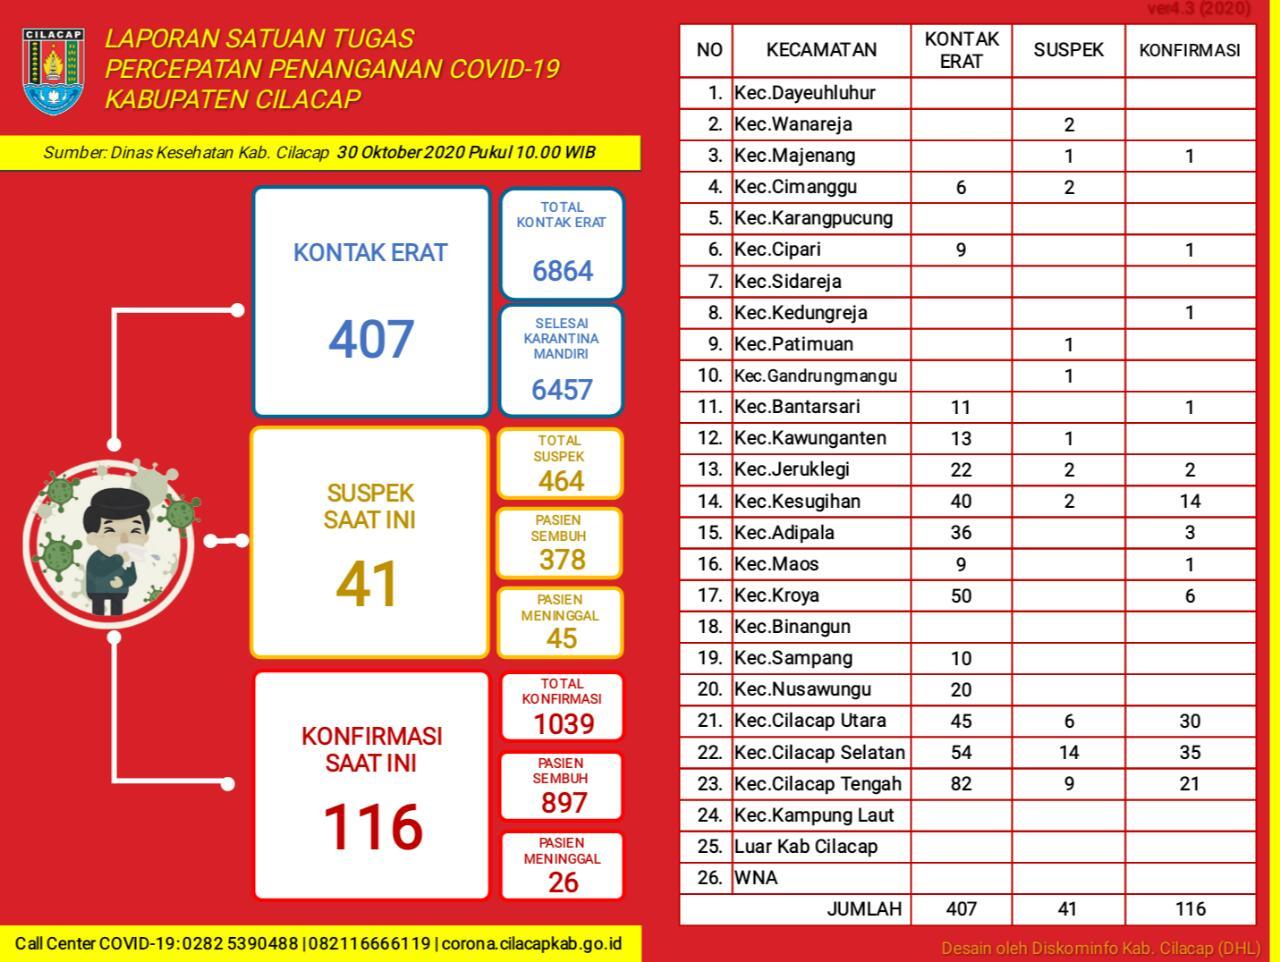 Laporan Satuan Tugas Percepatan Penanganan Covid-19 Kabupaten Cilacap, 30 Oktober 2020